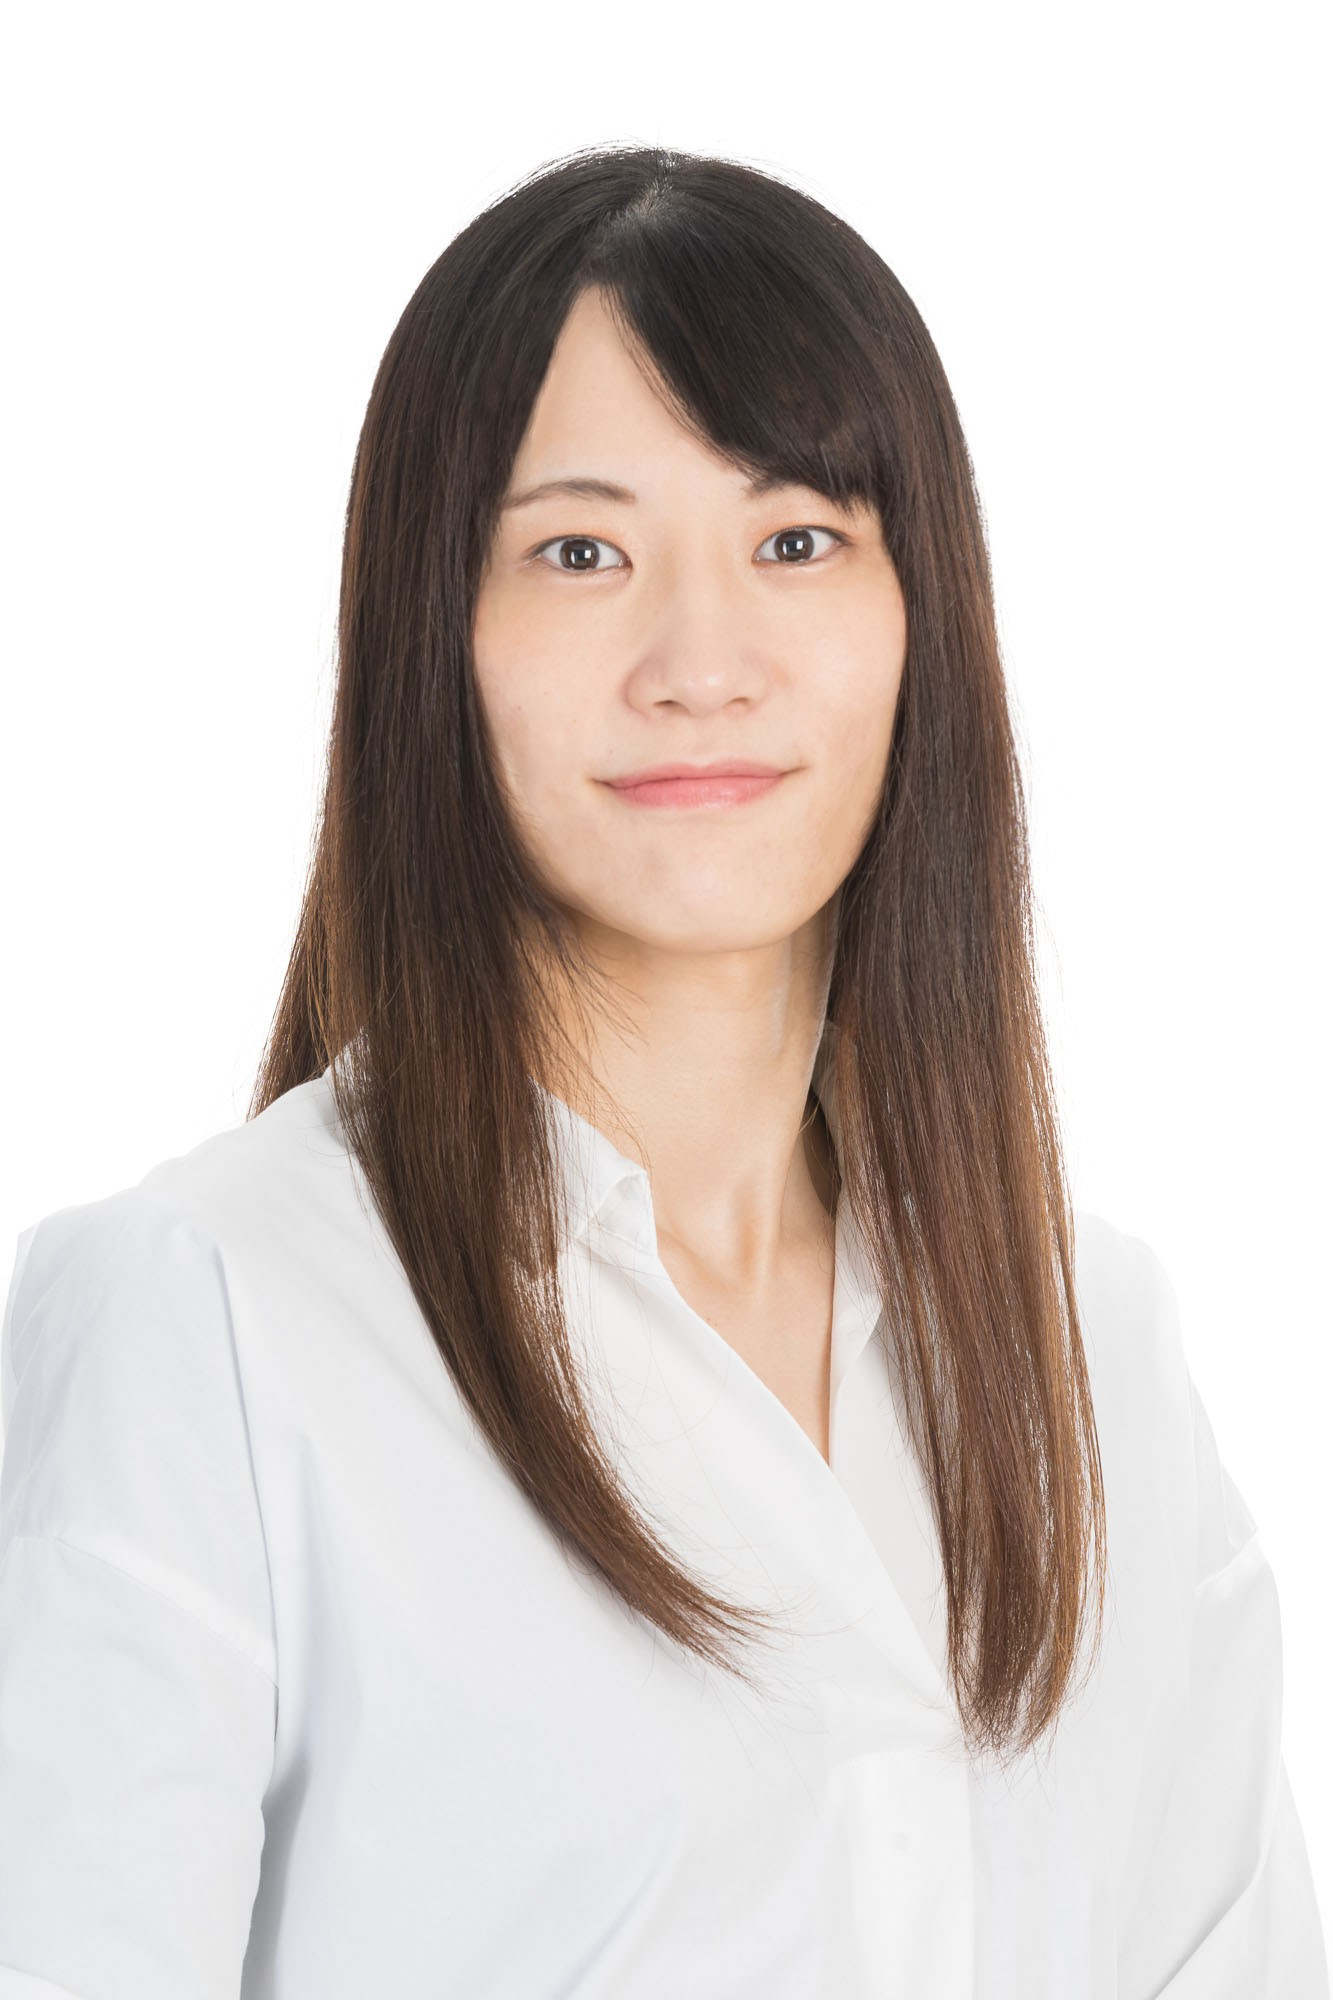 竹下由美子,YumikoTakeshita